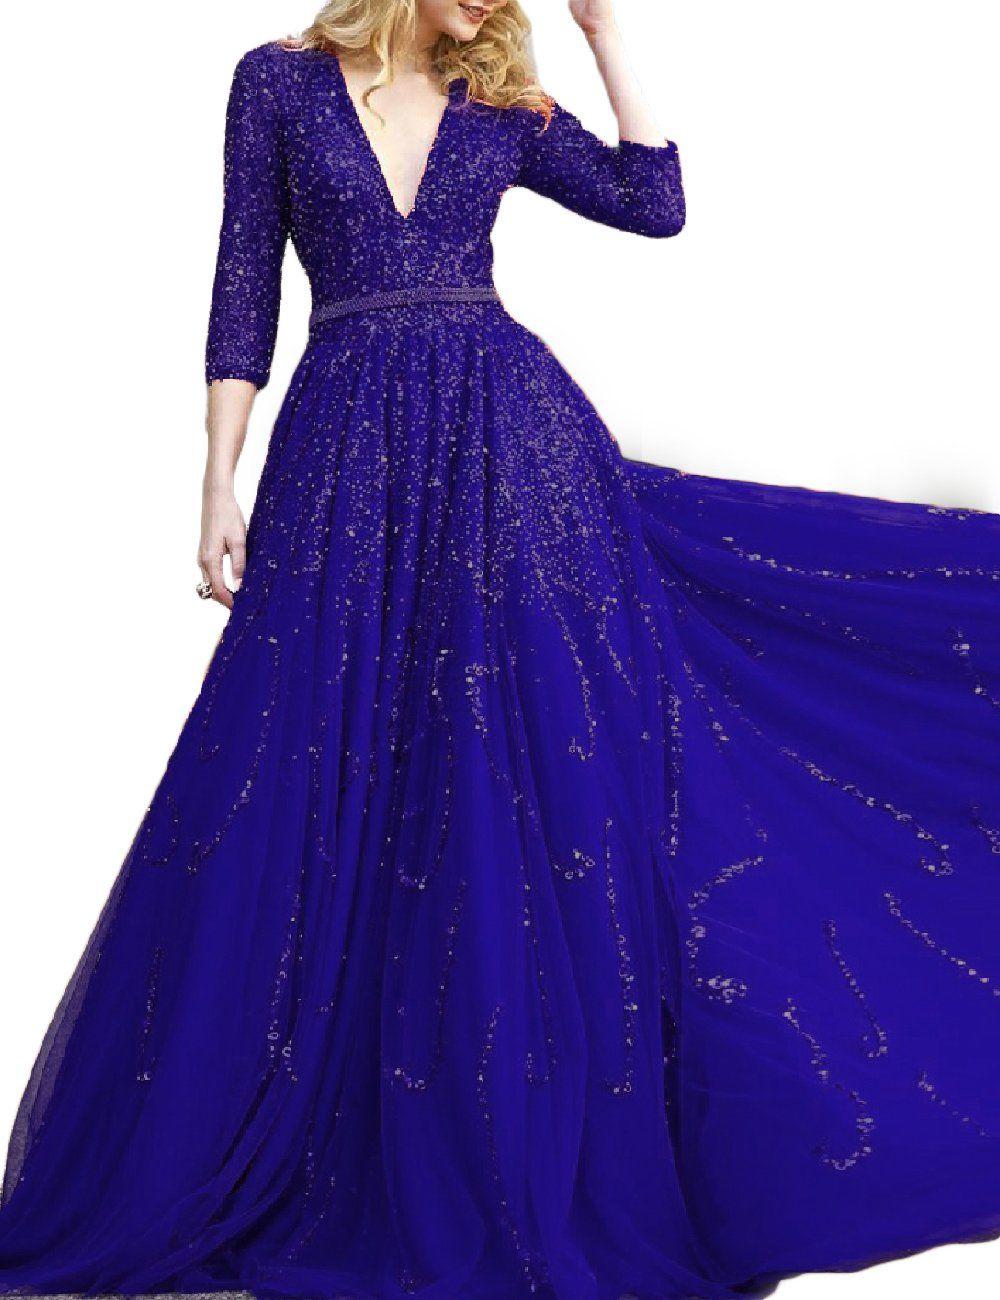 Promcc womenus long sleeve prom dresses vneck aline evening dress